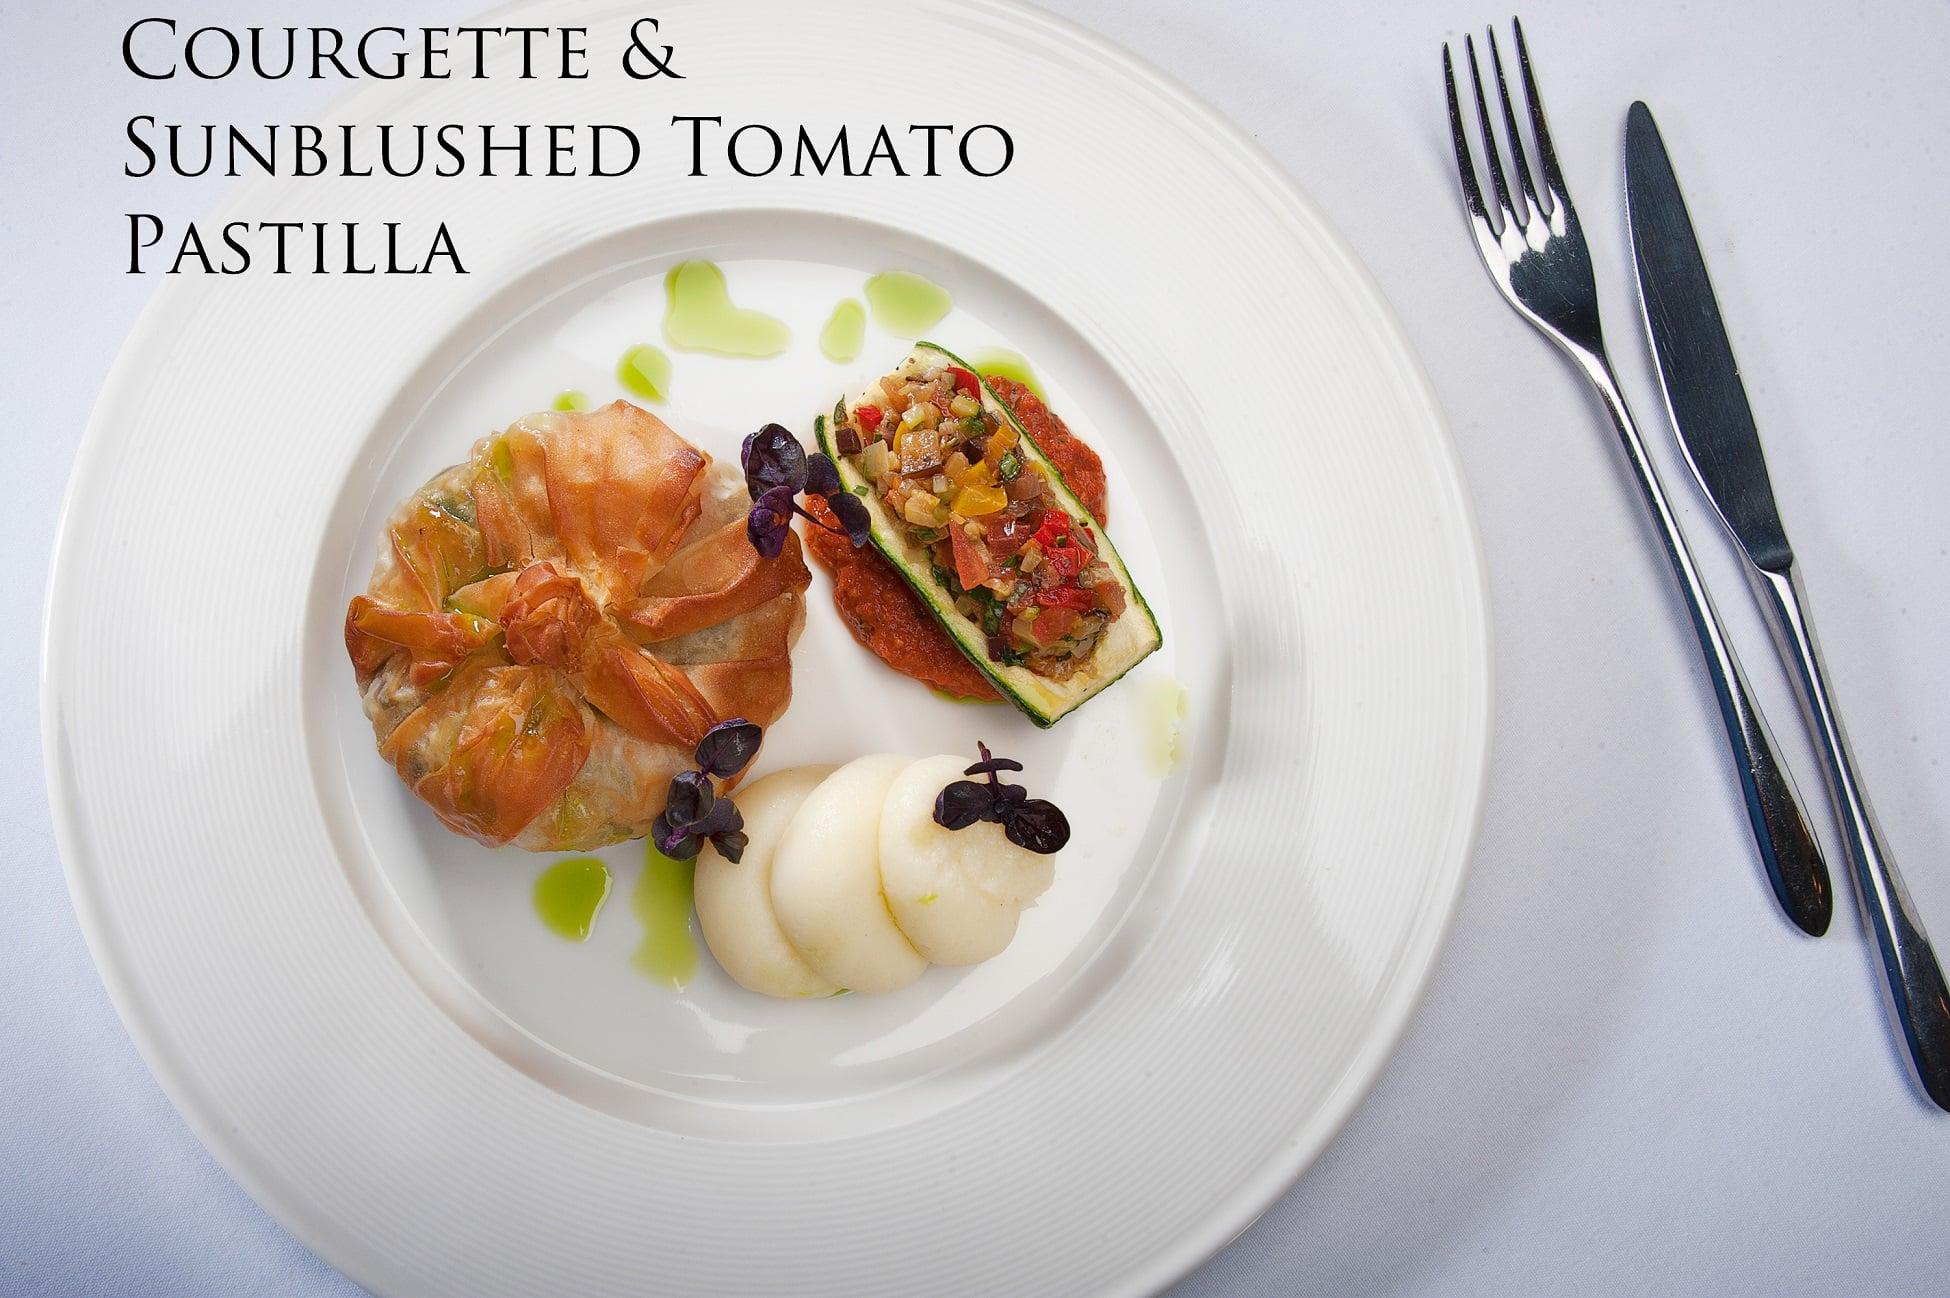 Pastilla - Beales Gourmet Catering